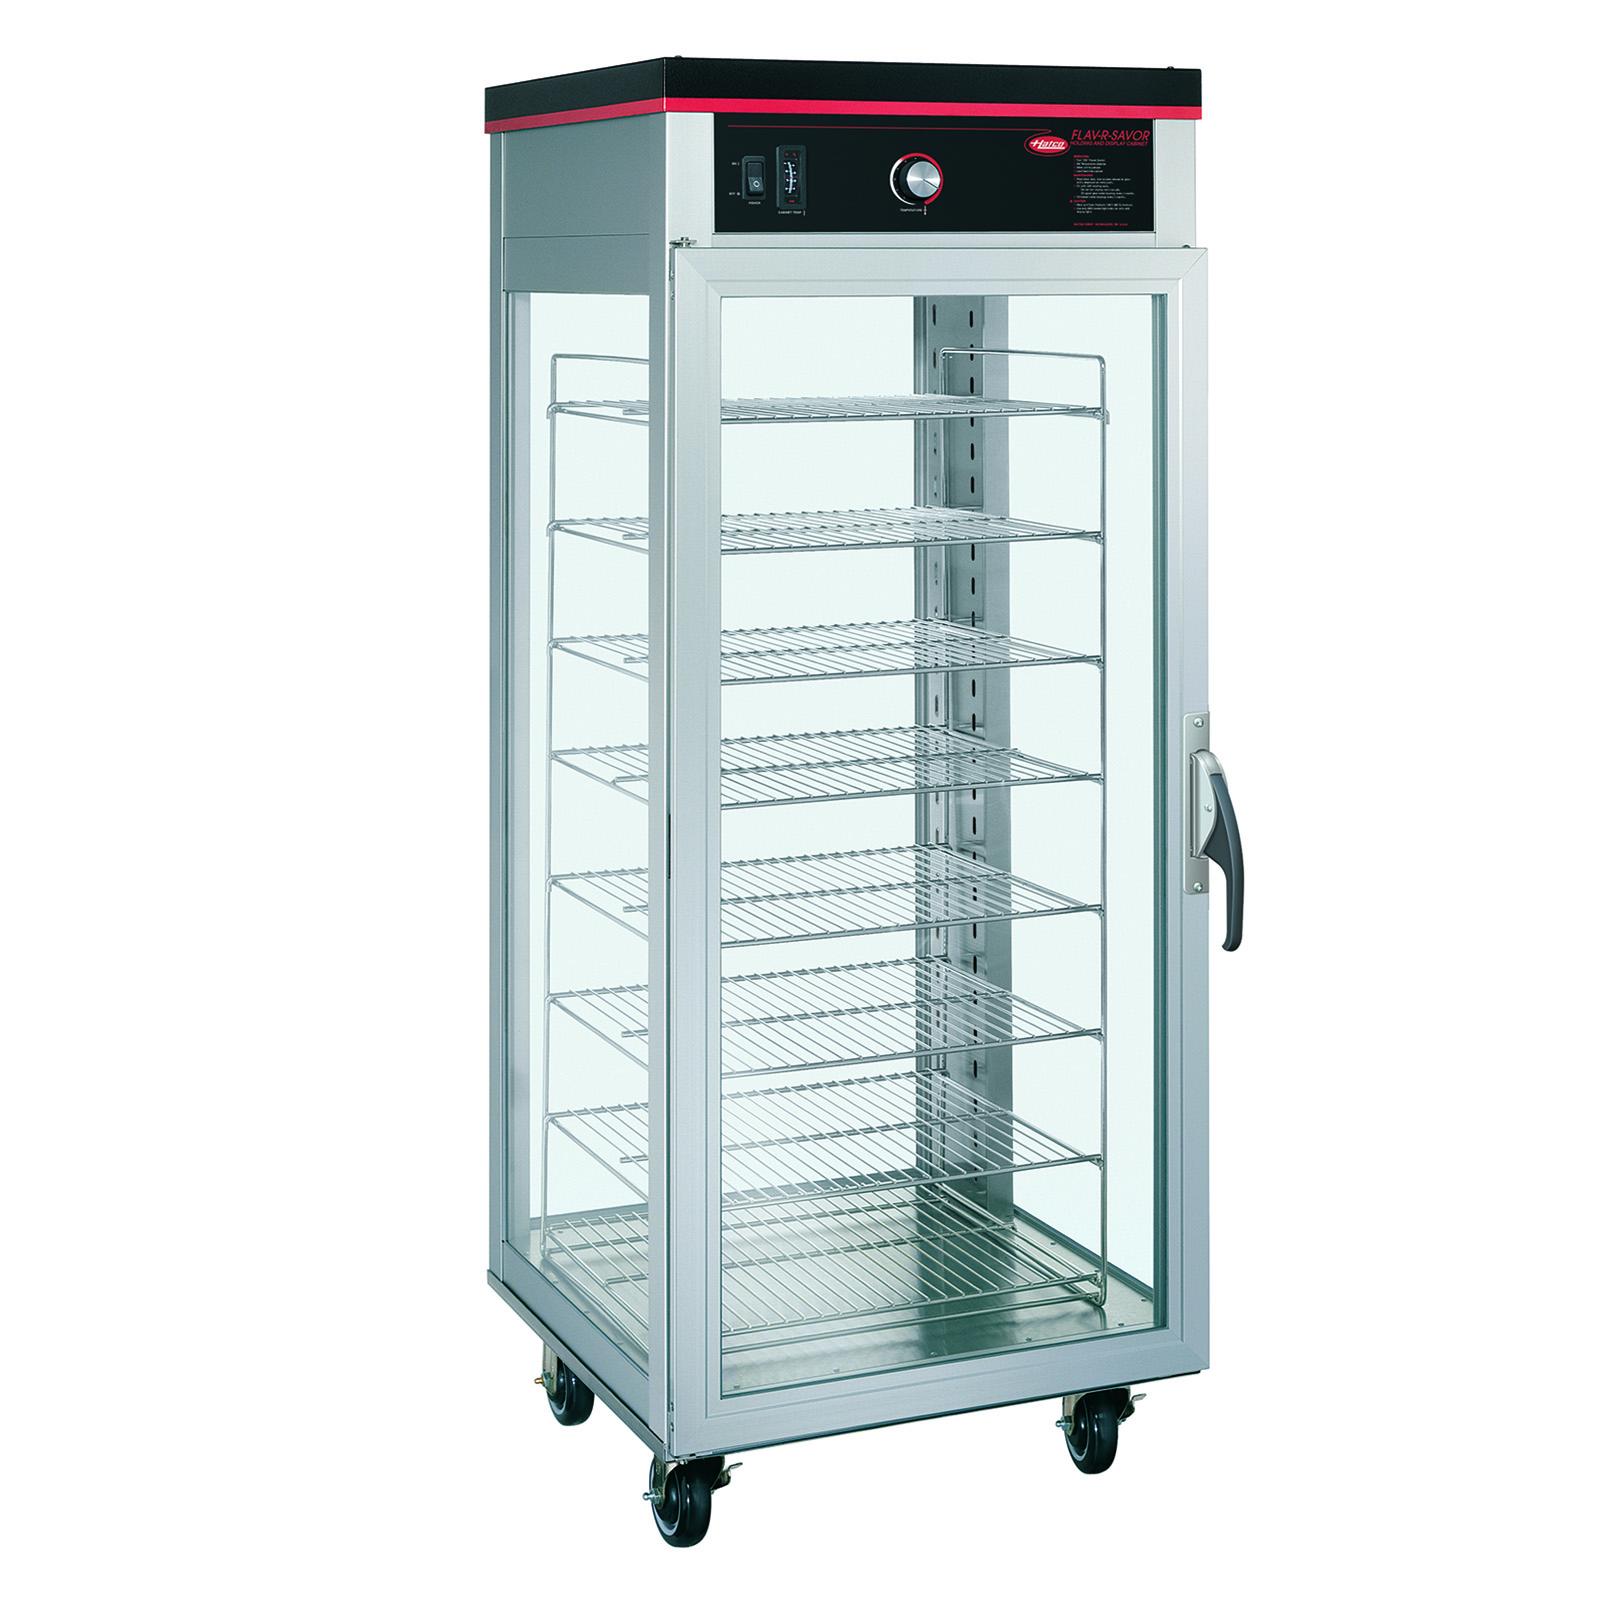 Hatco PFST-1X display cabinets